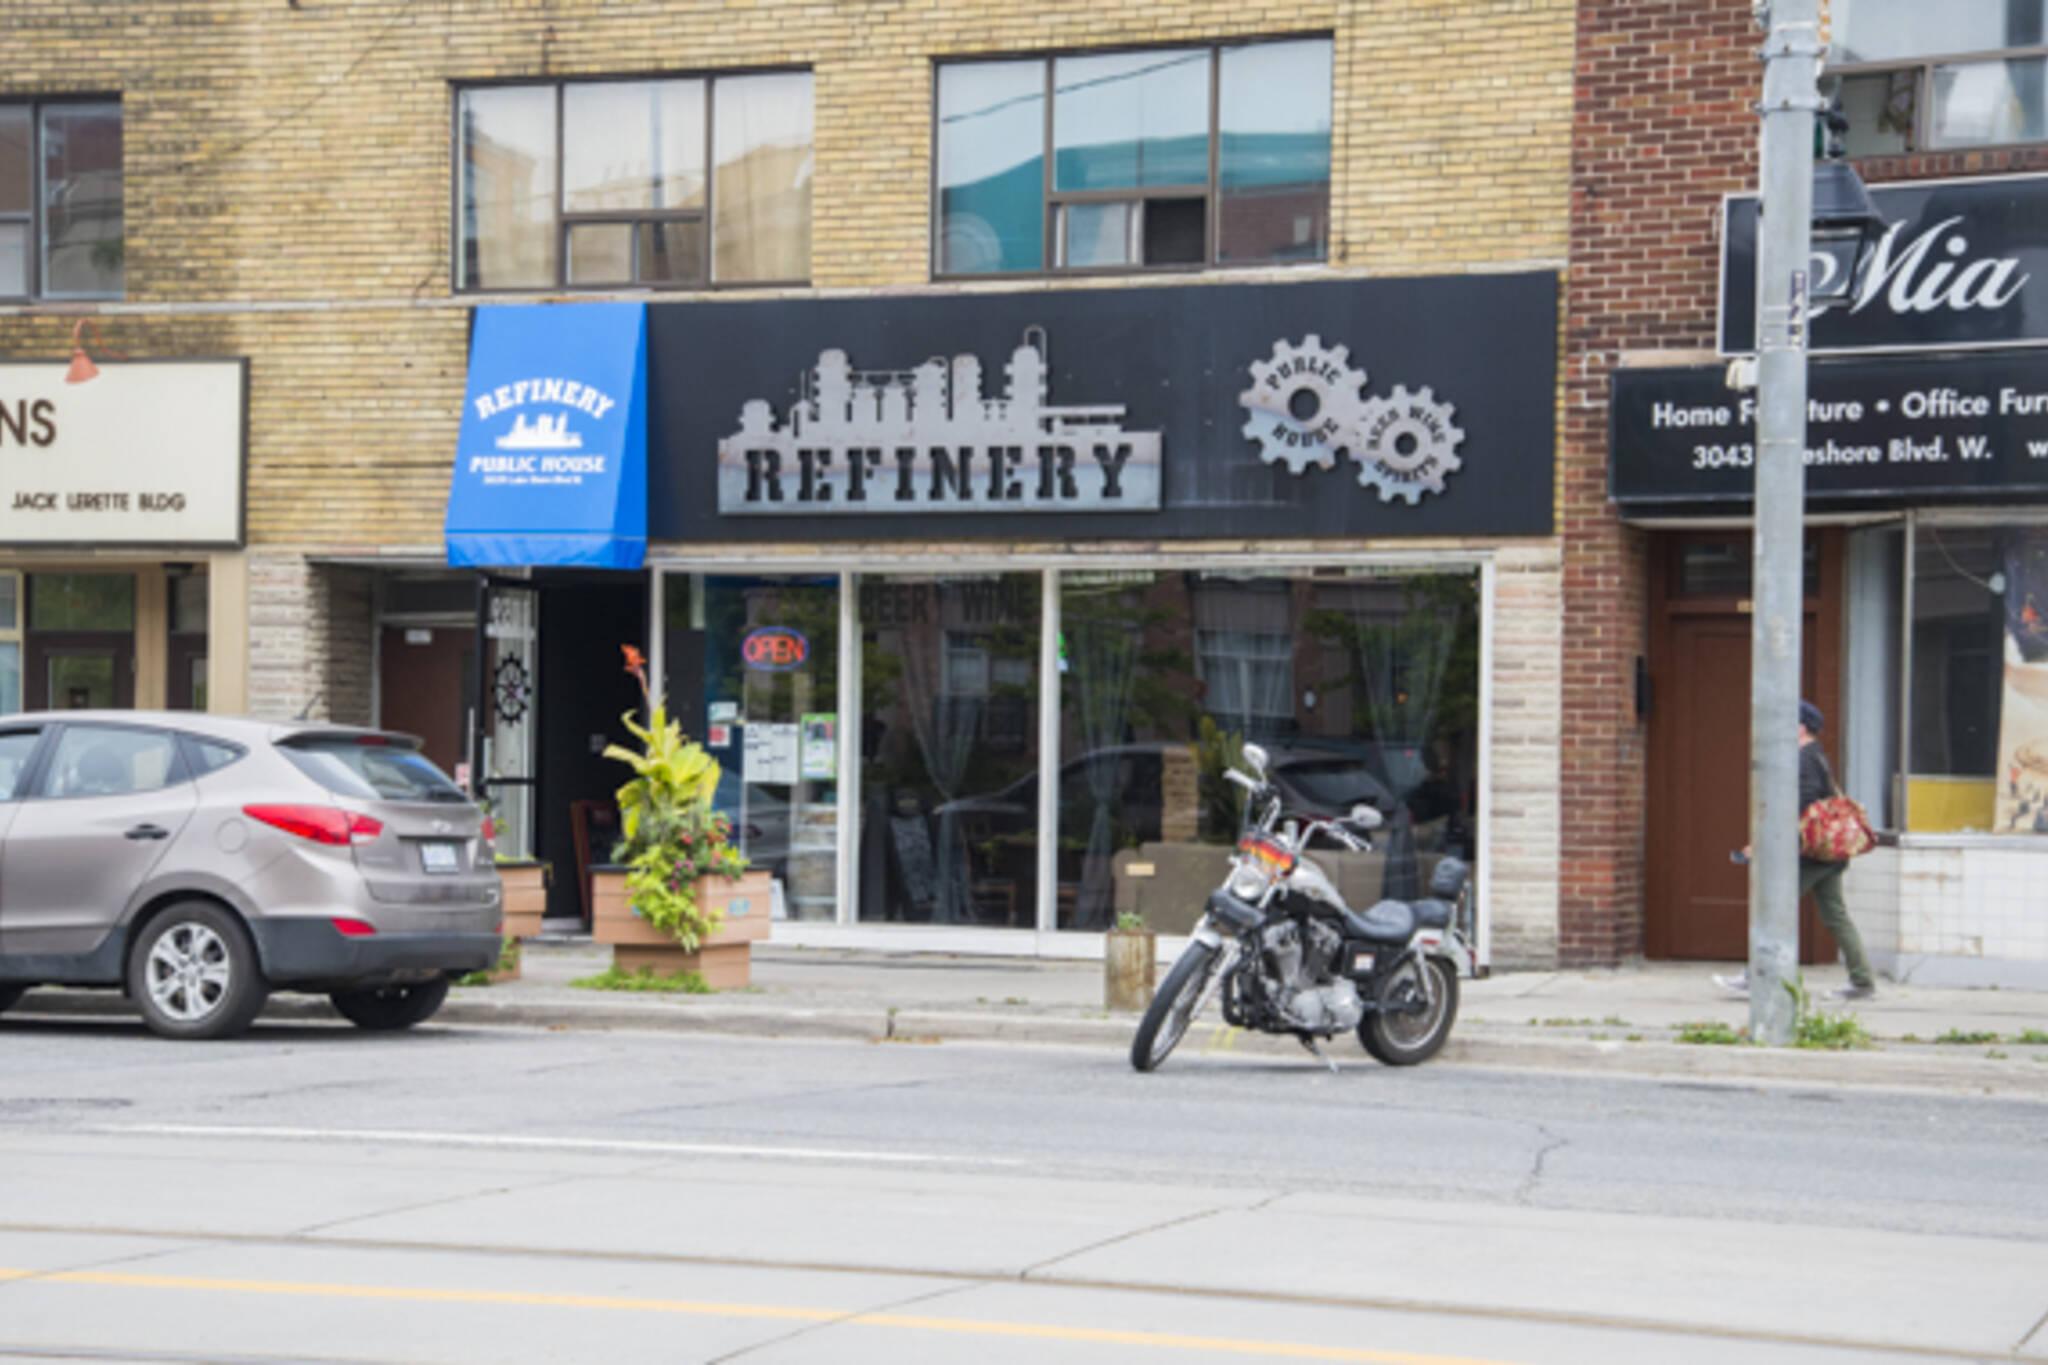 Refinery Pub Toronto